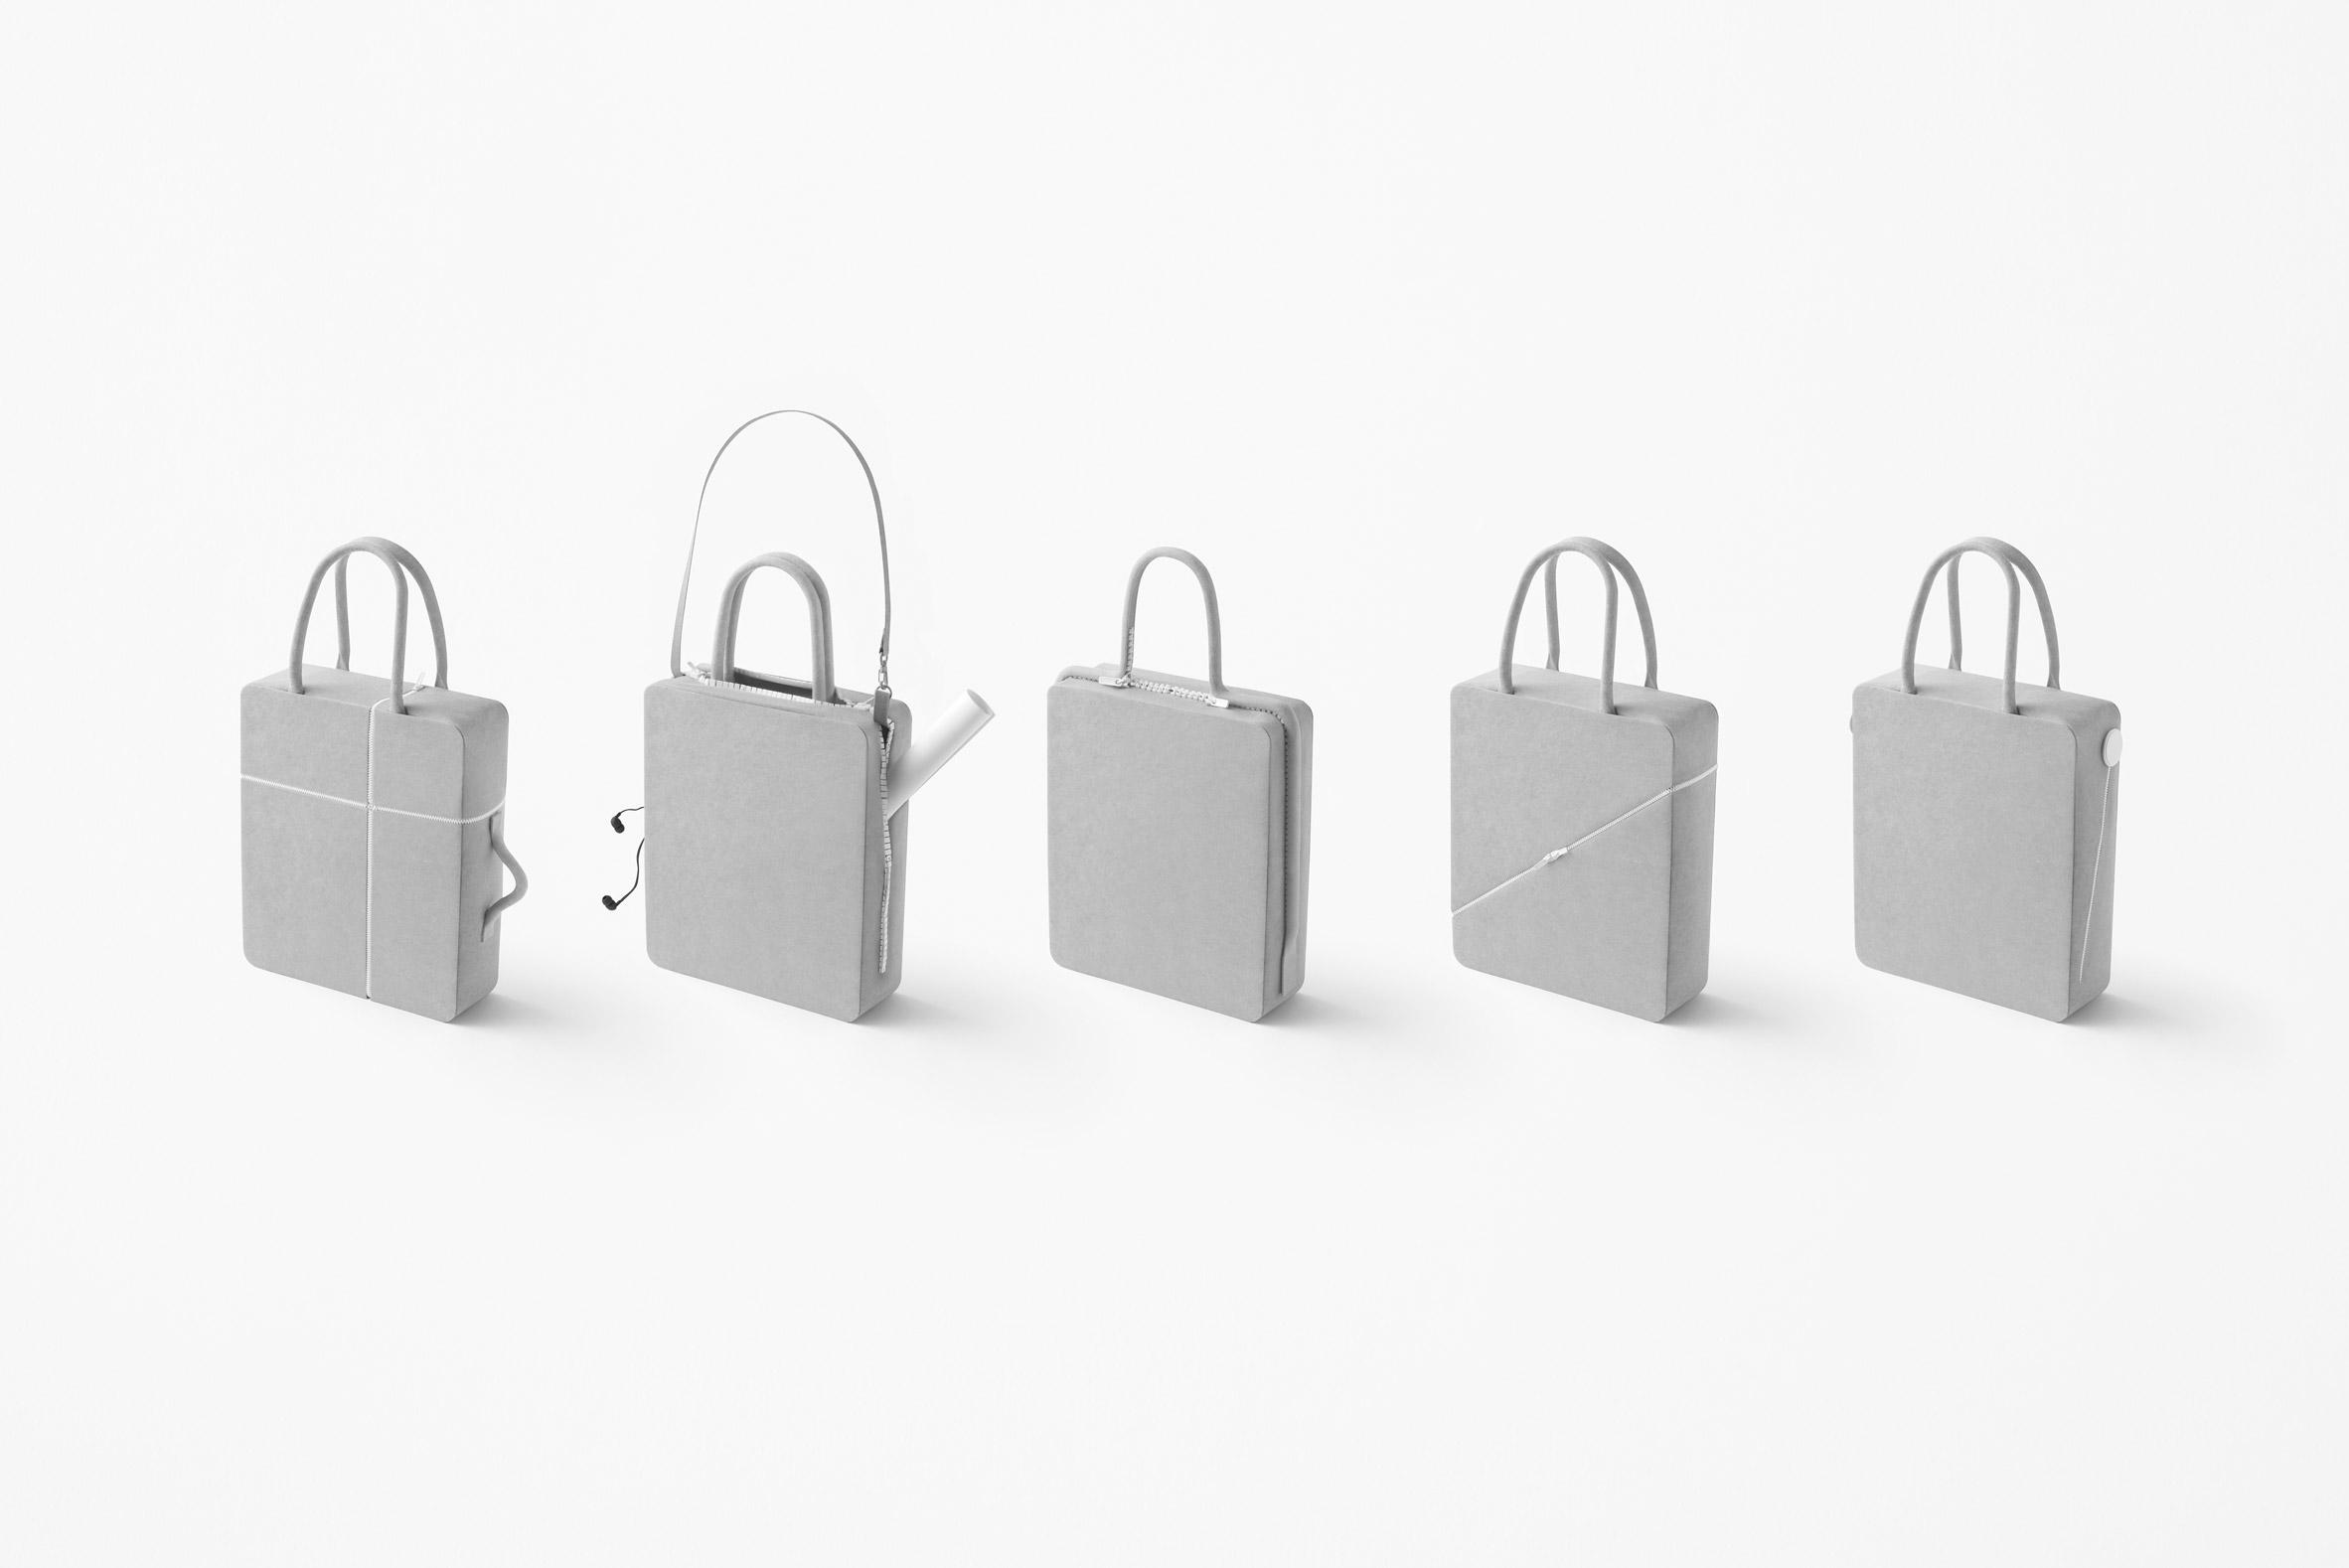 Nendo designs five alternatives to the standard zipper